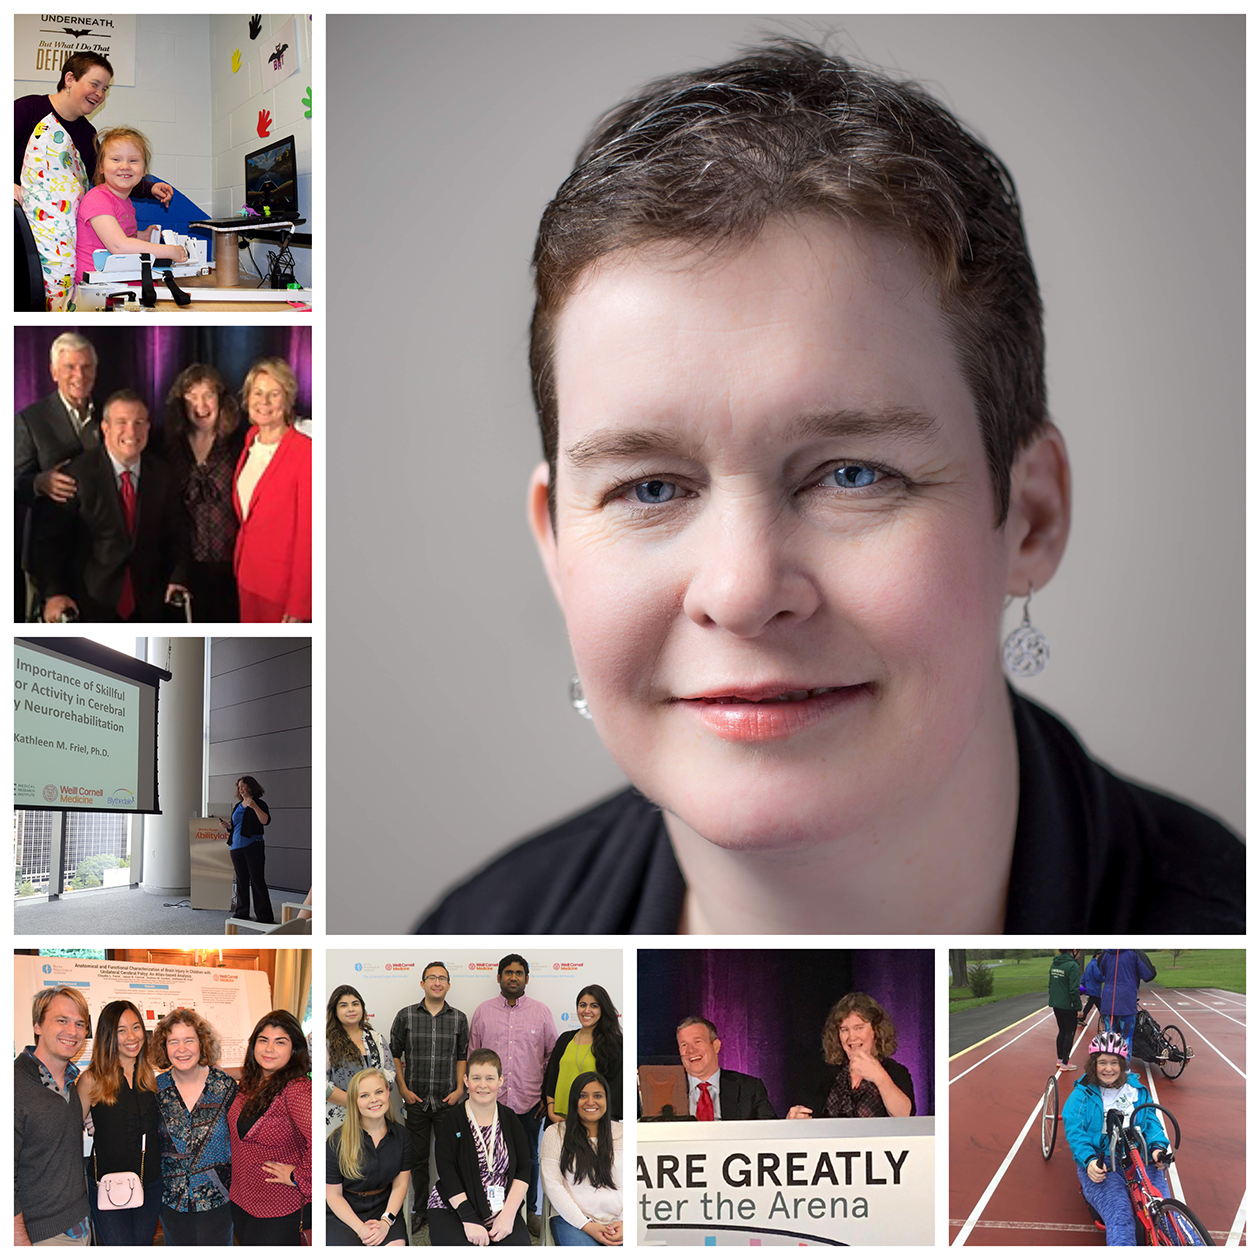 Photo collage of Kathleen